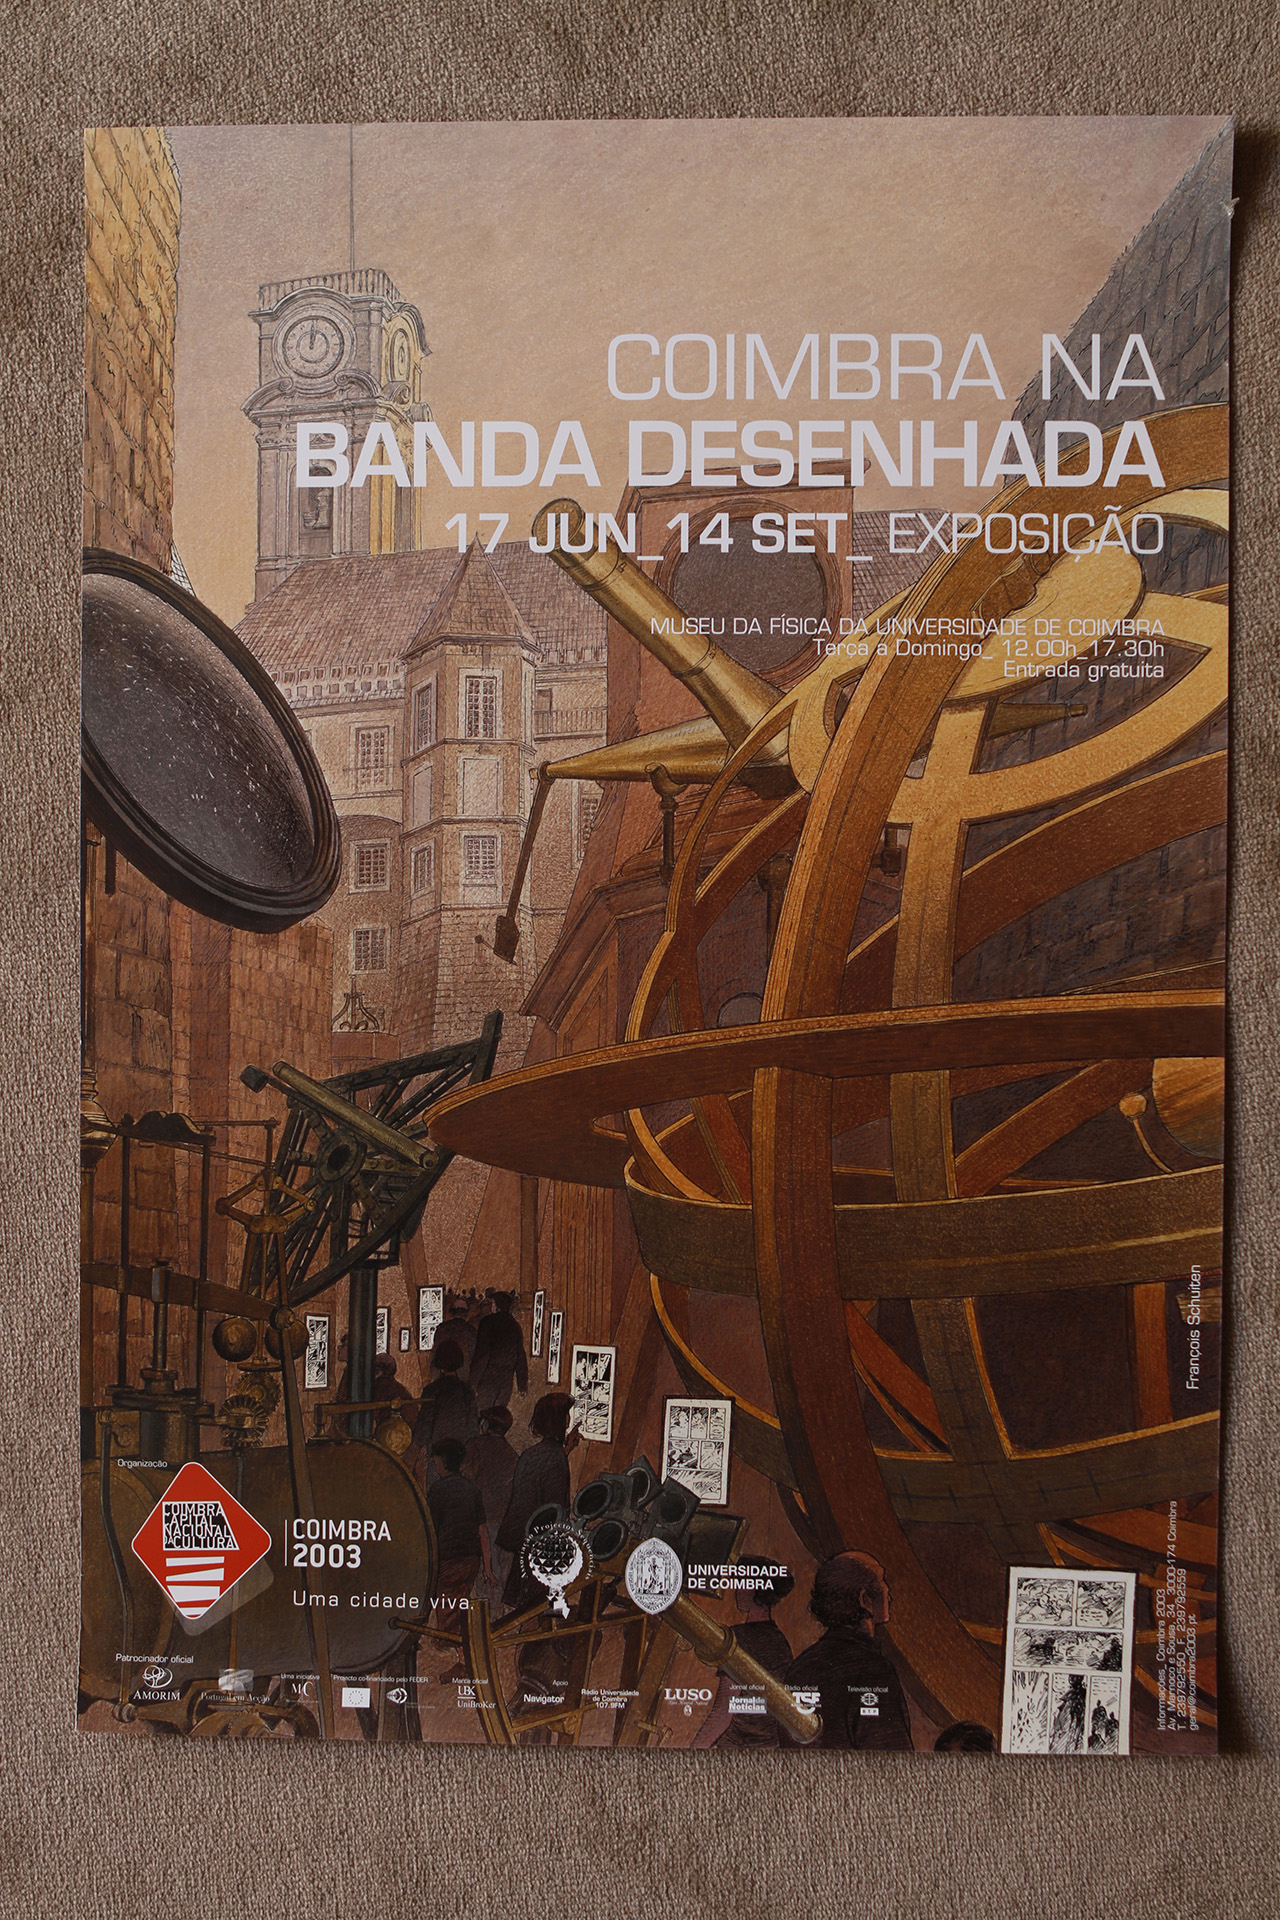 Coïmbra na Banda Desenhada© François Schuiten, 2003